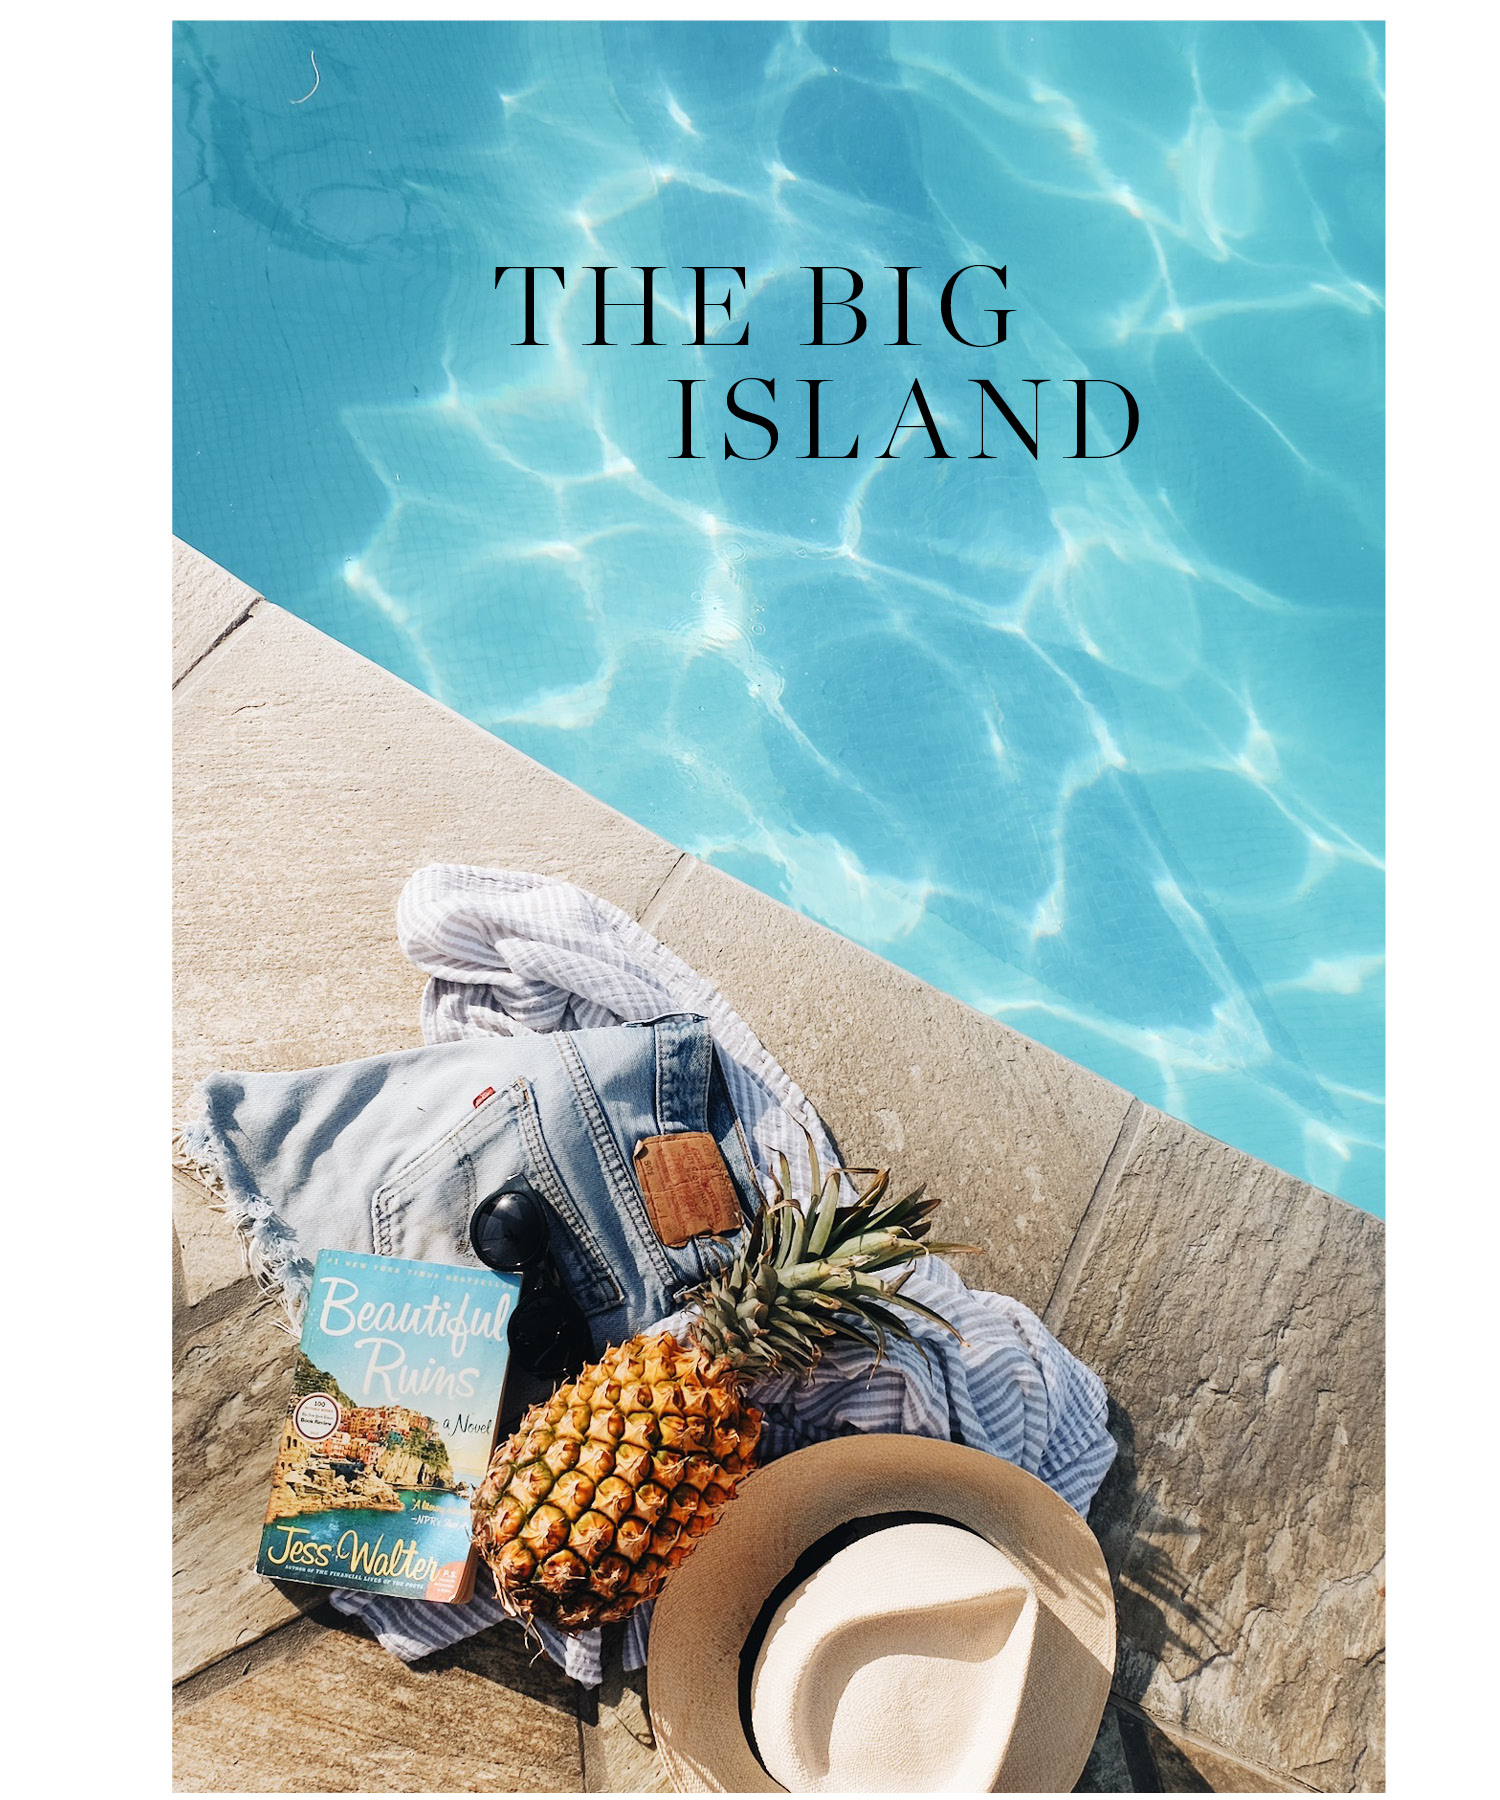 Big Island Travel Guide by Dulci Edge